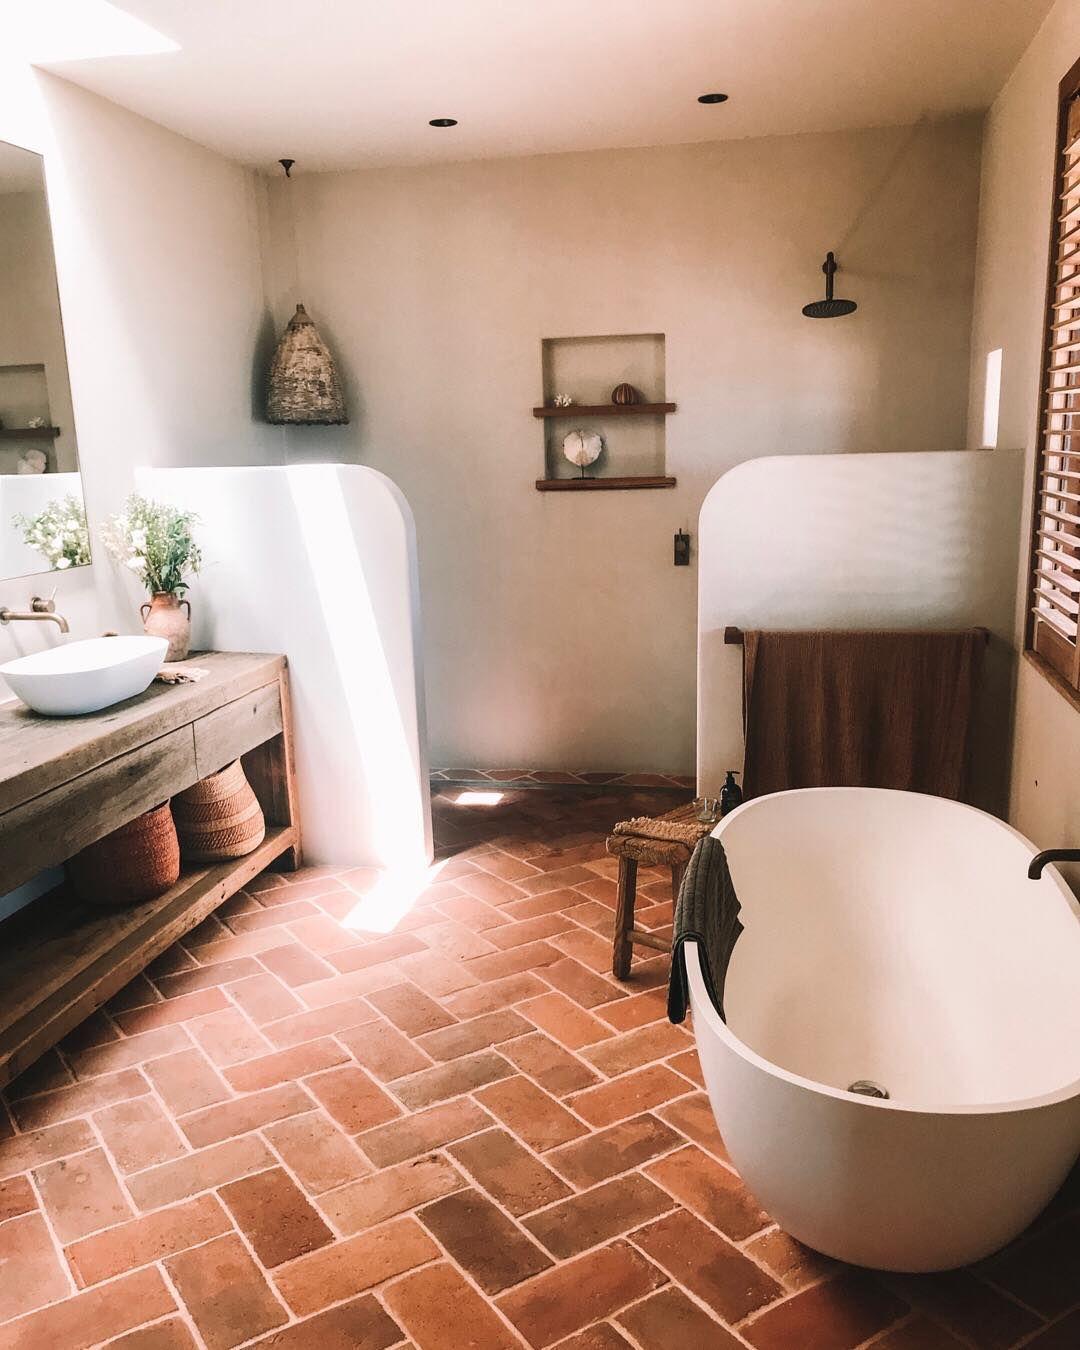 Therangebyronbay Banheiros Incriveis Design De Casa Banho De Luxo